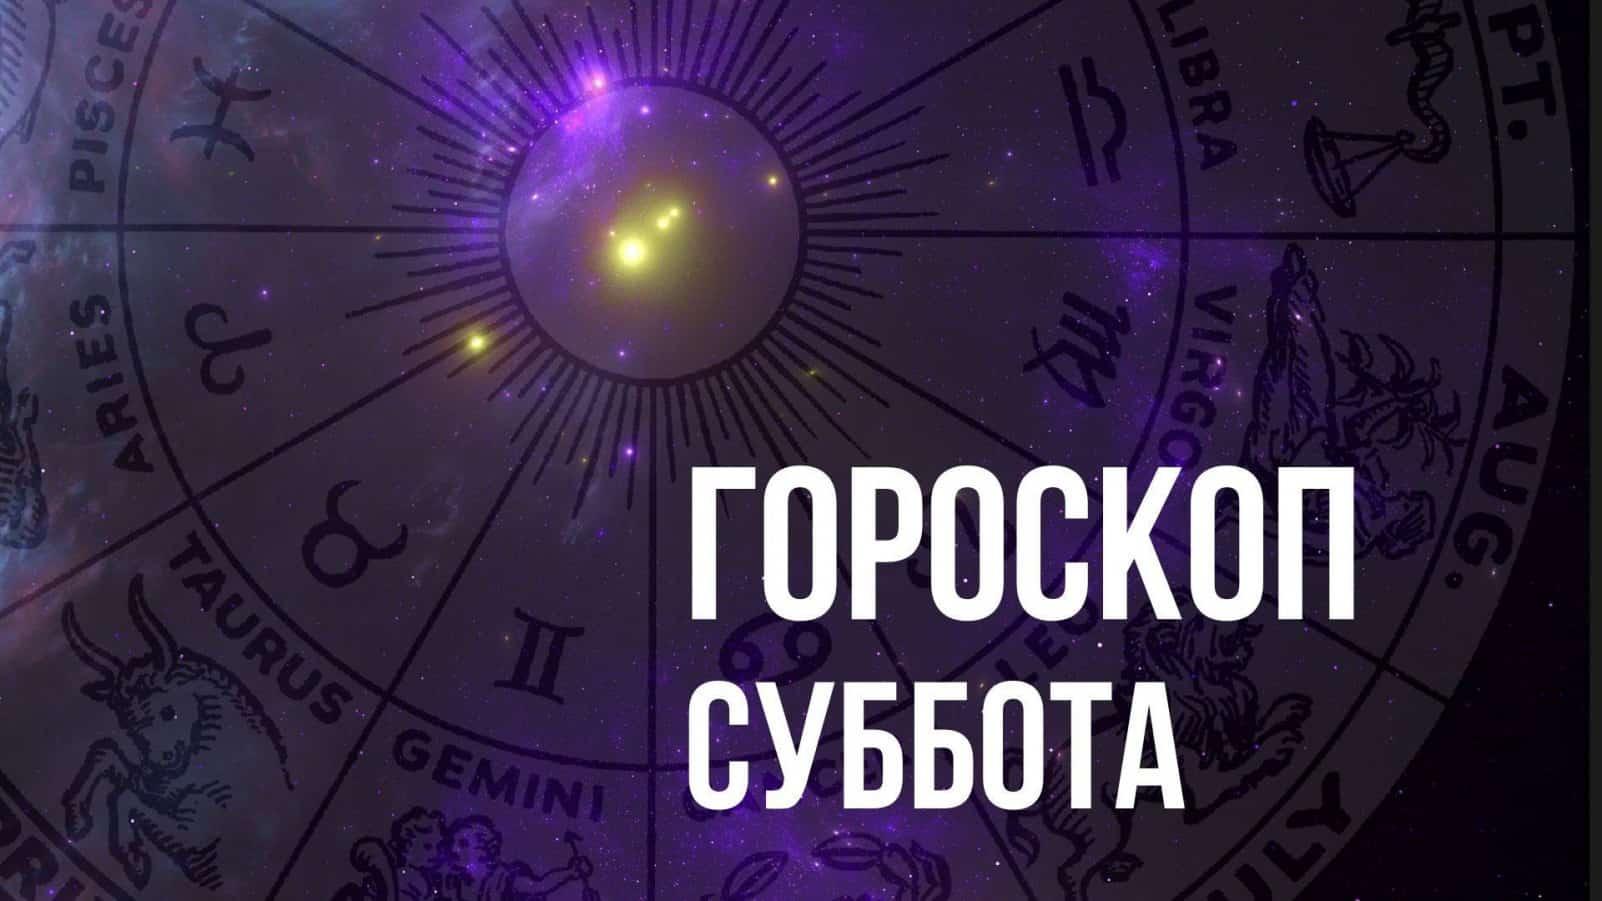 Гороскоп на субботу 14 августа для каждого знака Зодиака